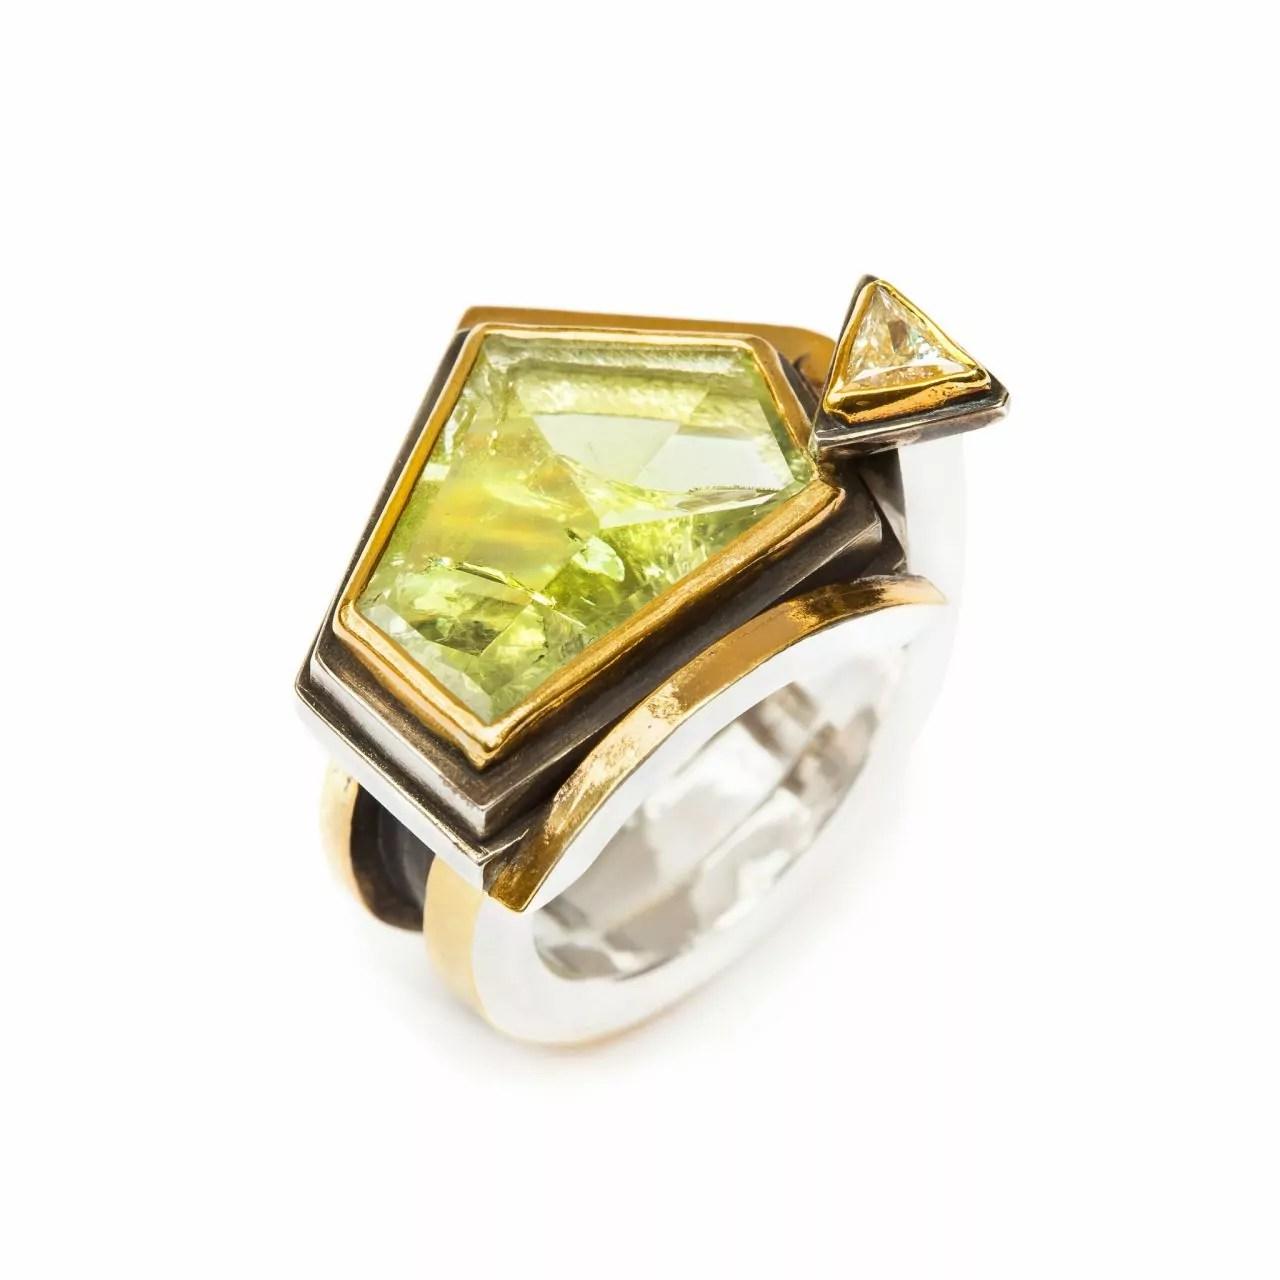 Ring with Beryl and Diamond